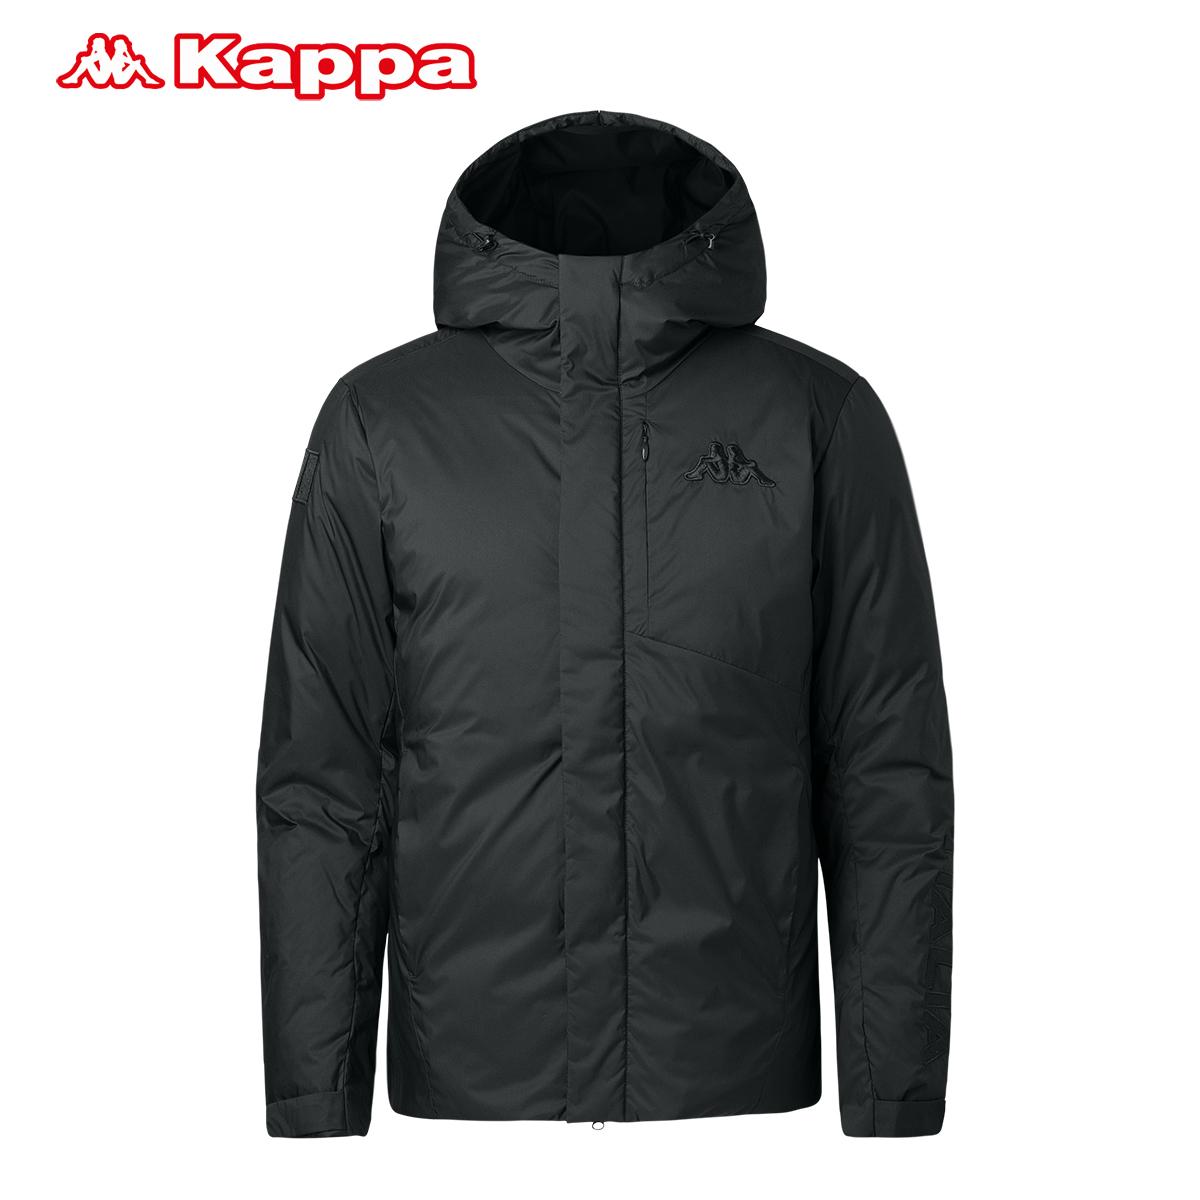 Kappa卡帕 男款羽绒服运动外套 保暖上衣 2017冬季新款|KL752OT10